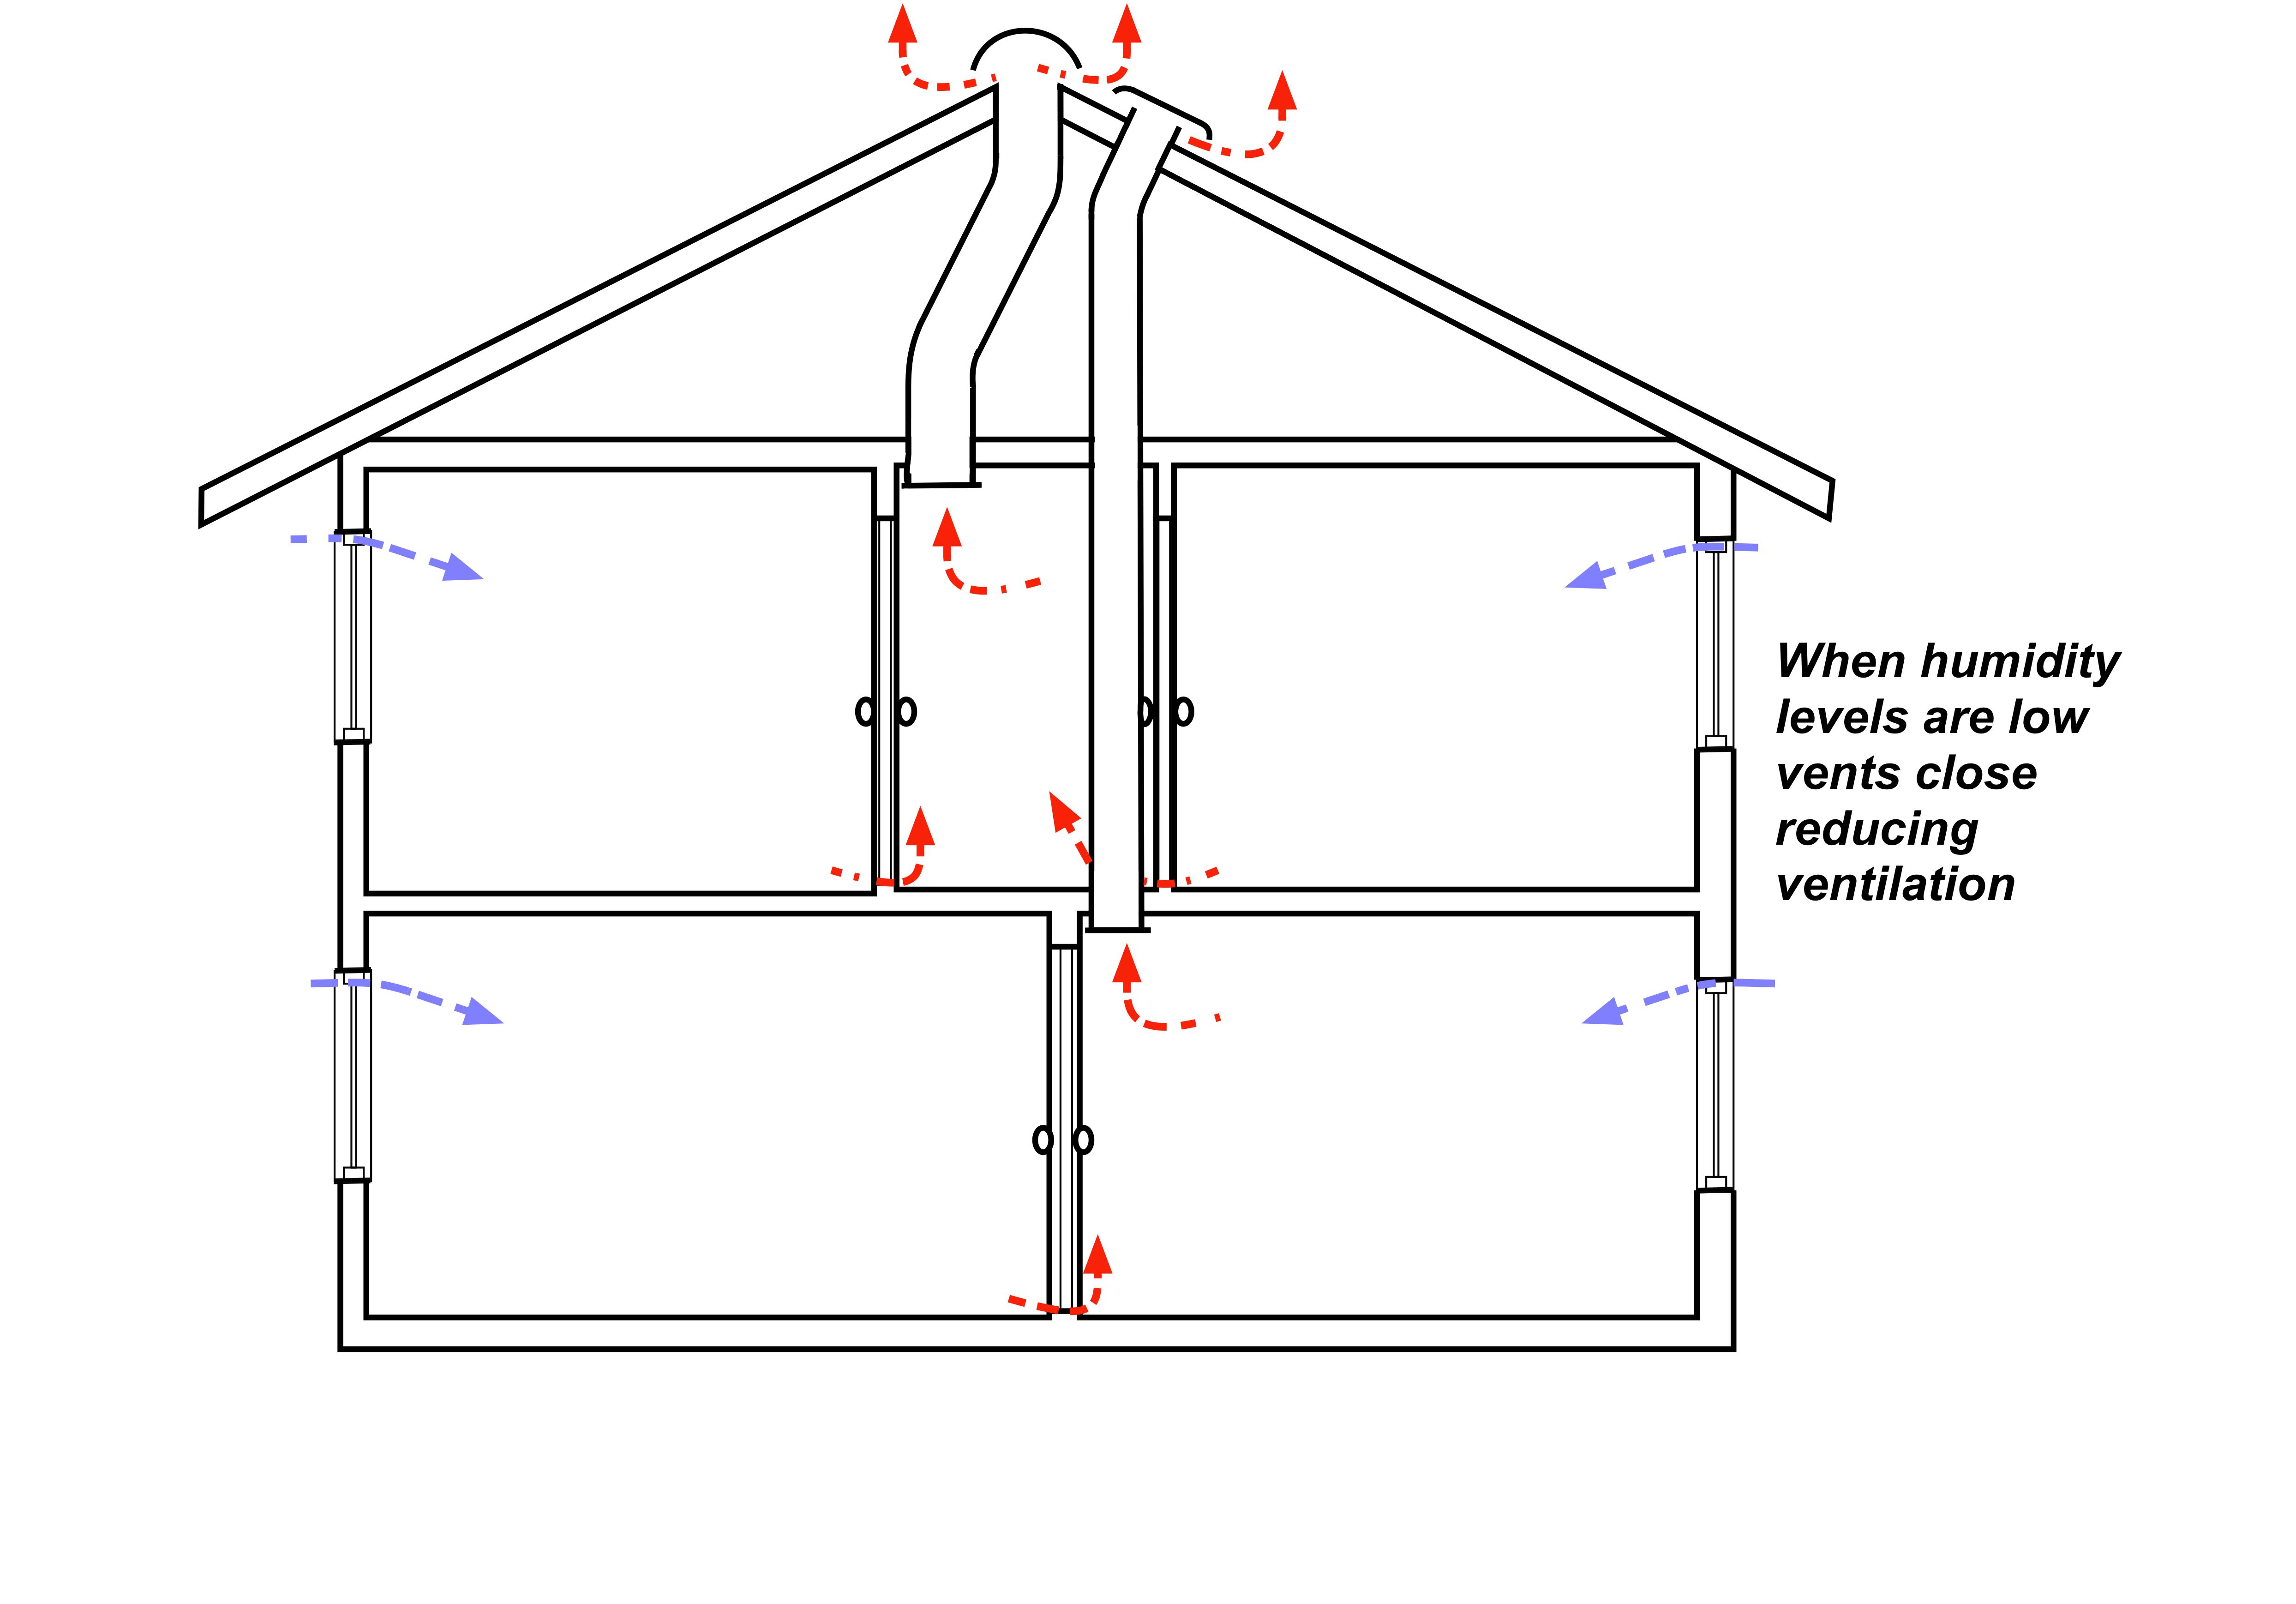 Passive Stack Ventilation Low Humidity